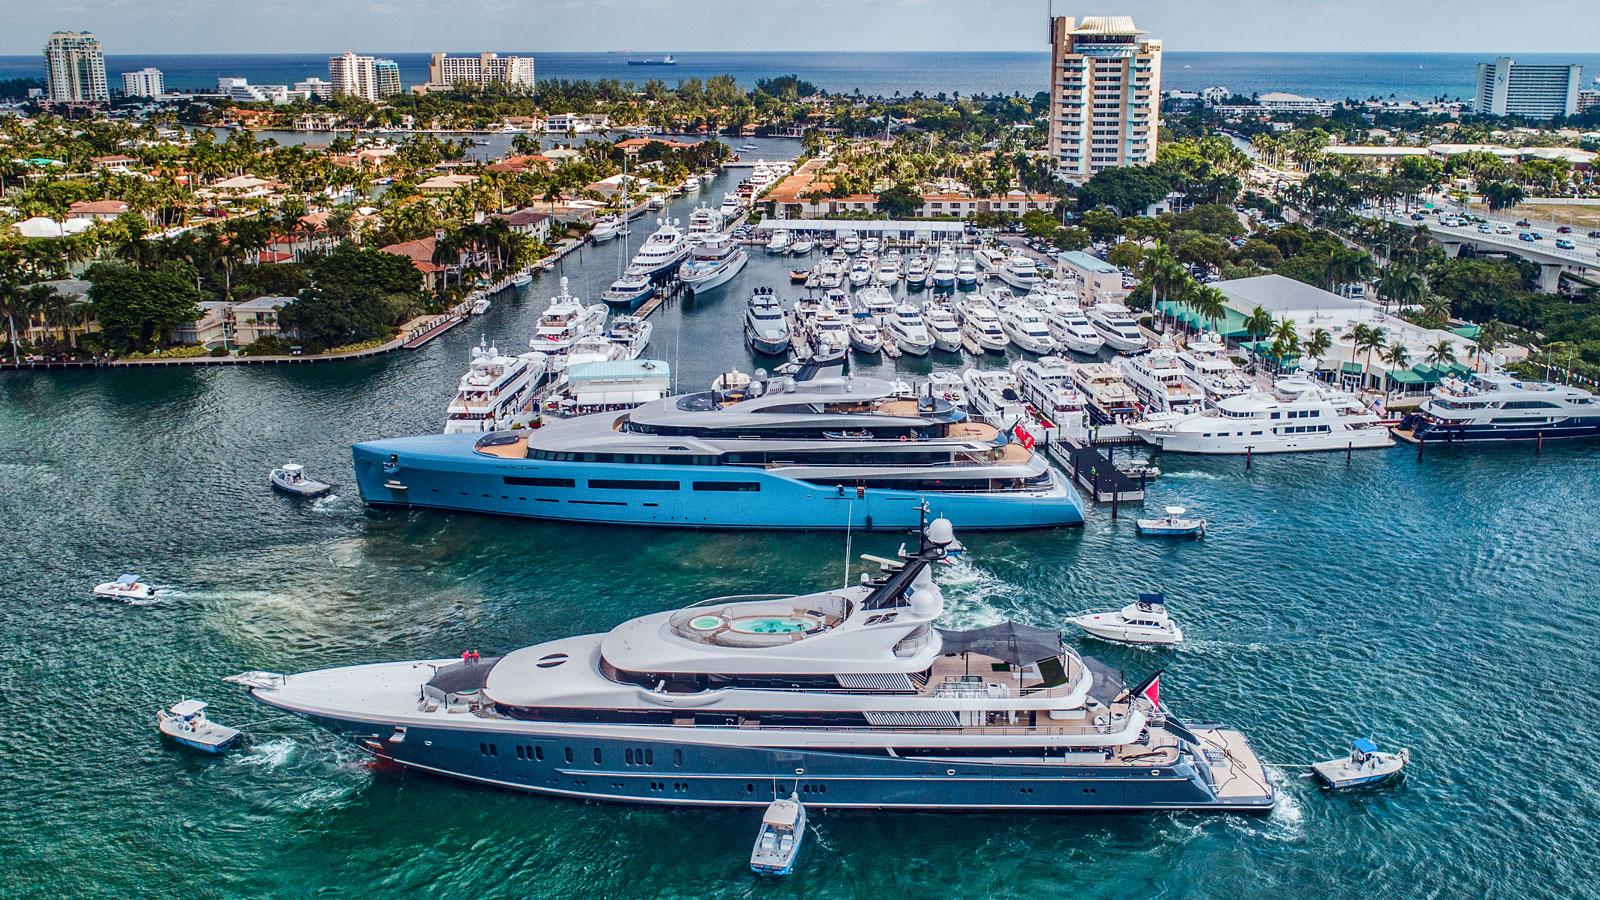 Fort Lauderdale International Boat Show 2021 será de 27 a 31 de outubro